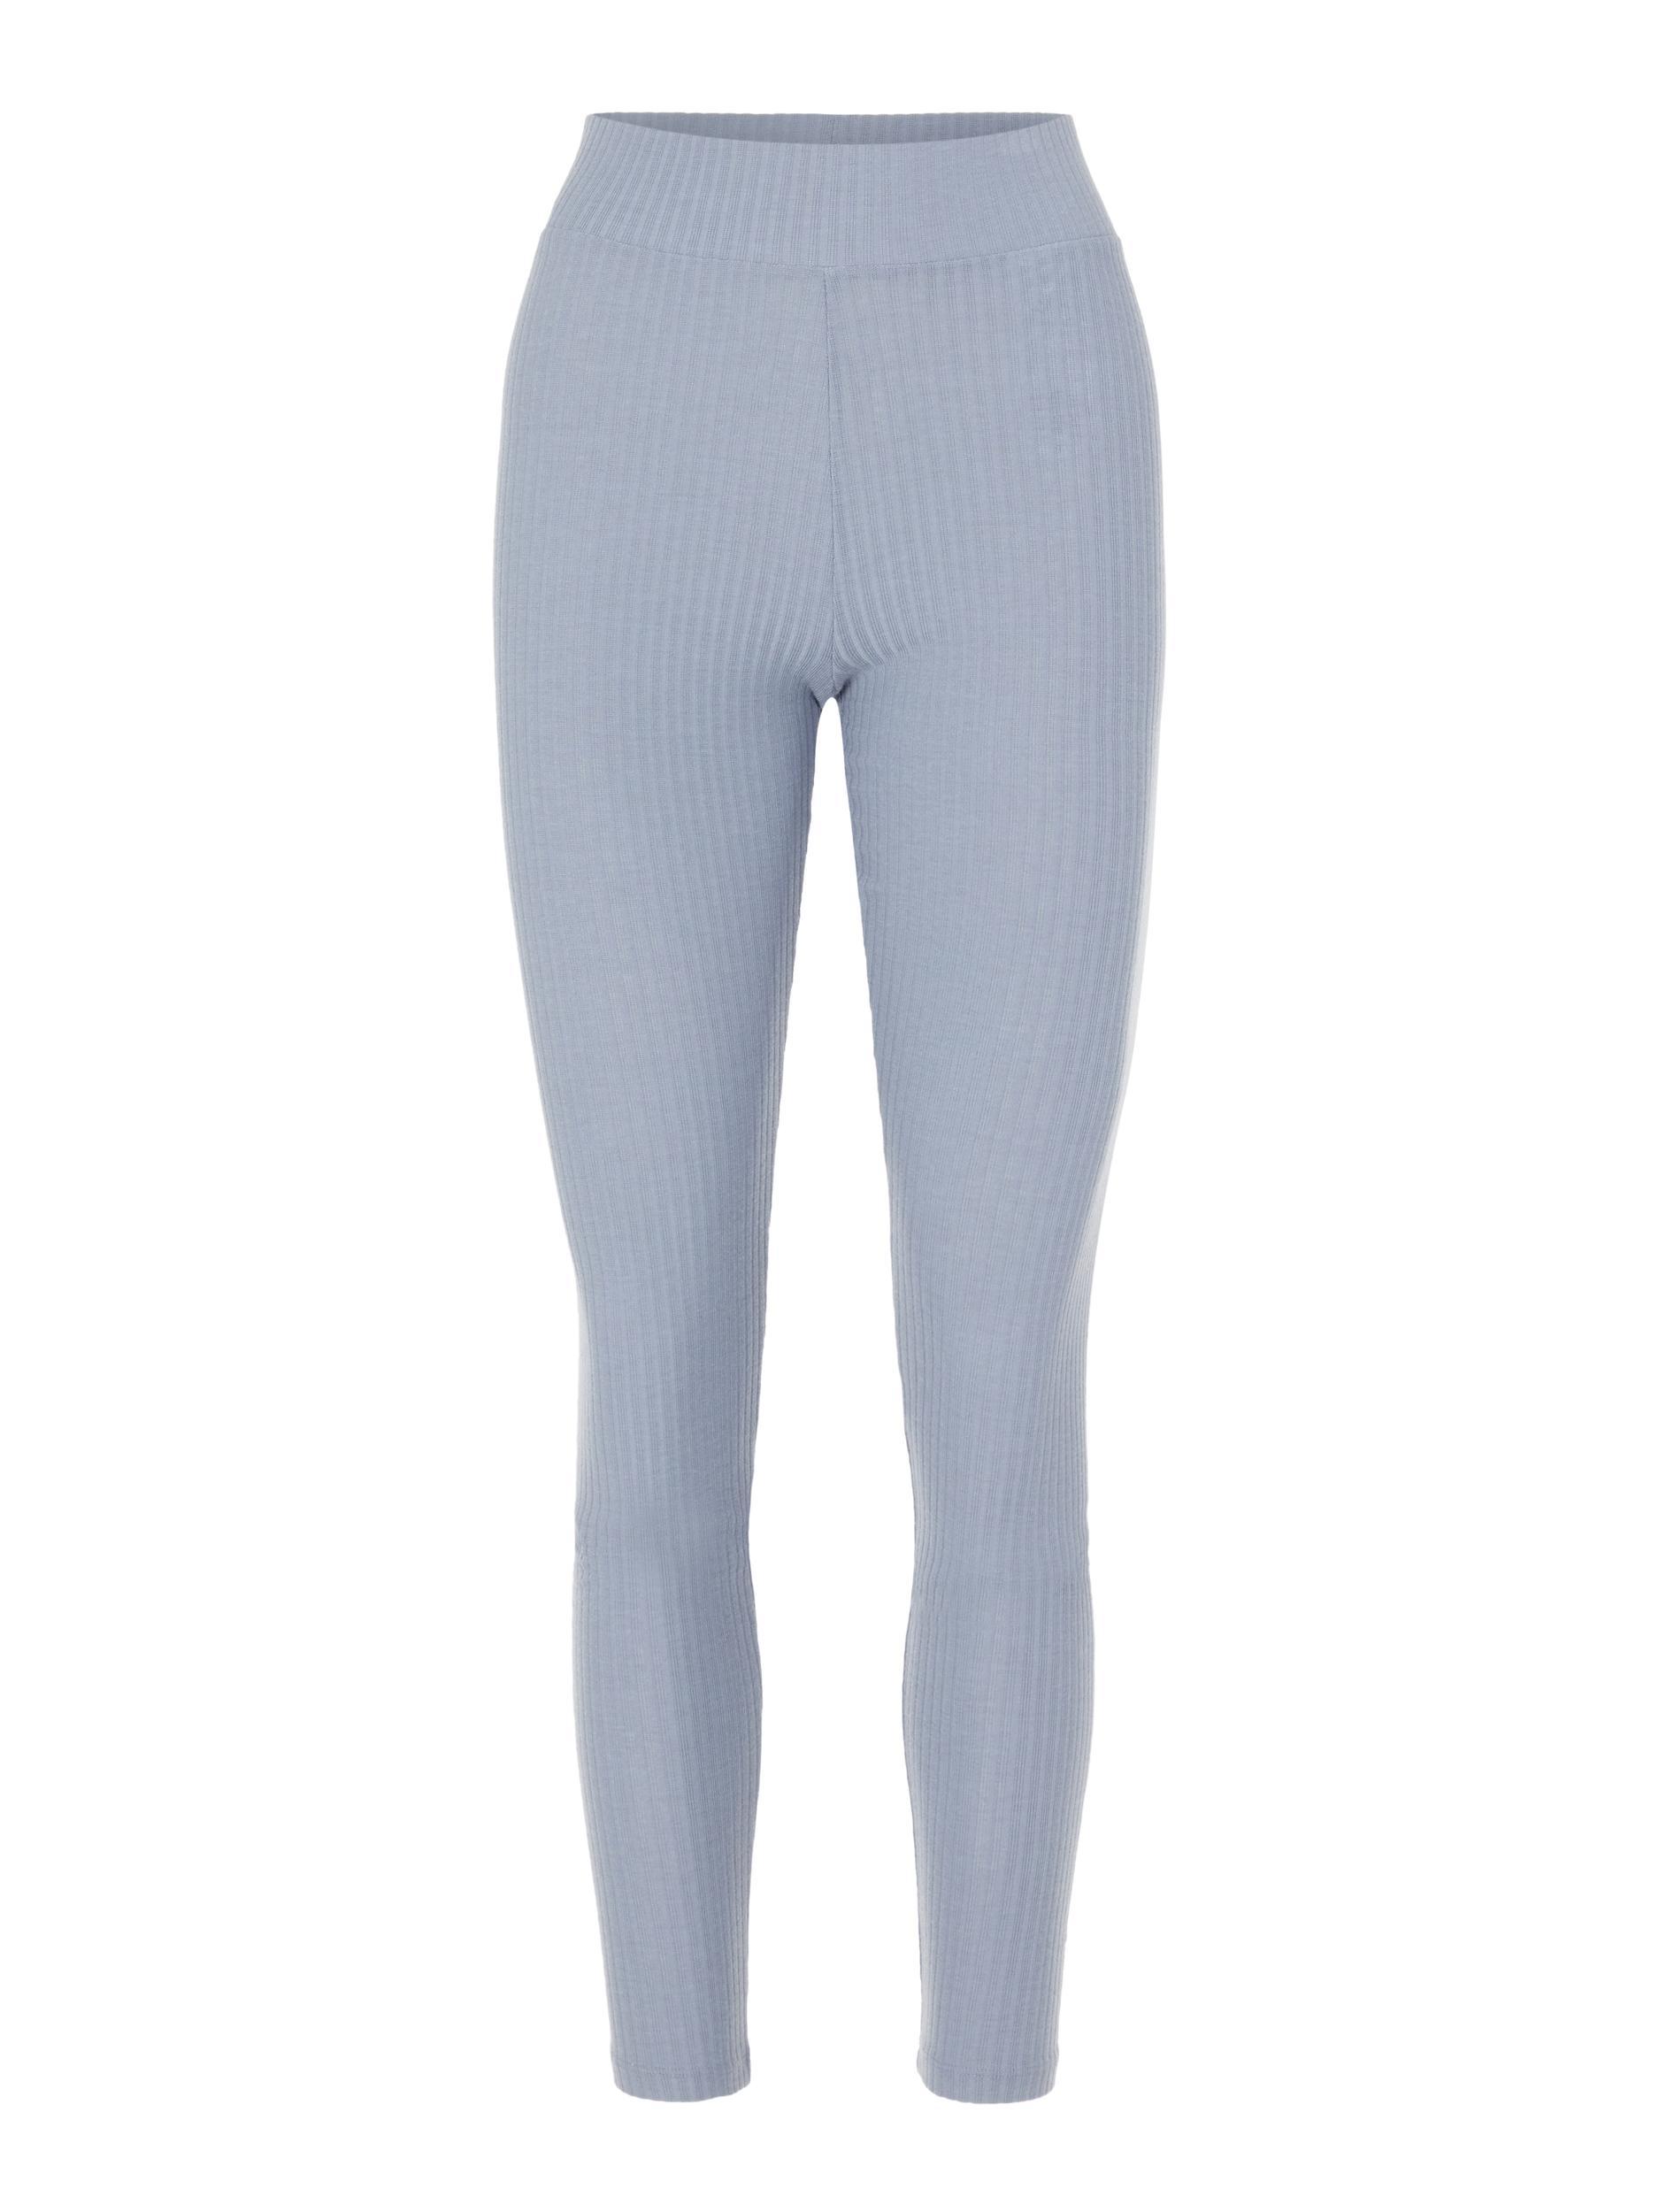 Pieces Ribbi HW leggings, Blue Fog, M